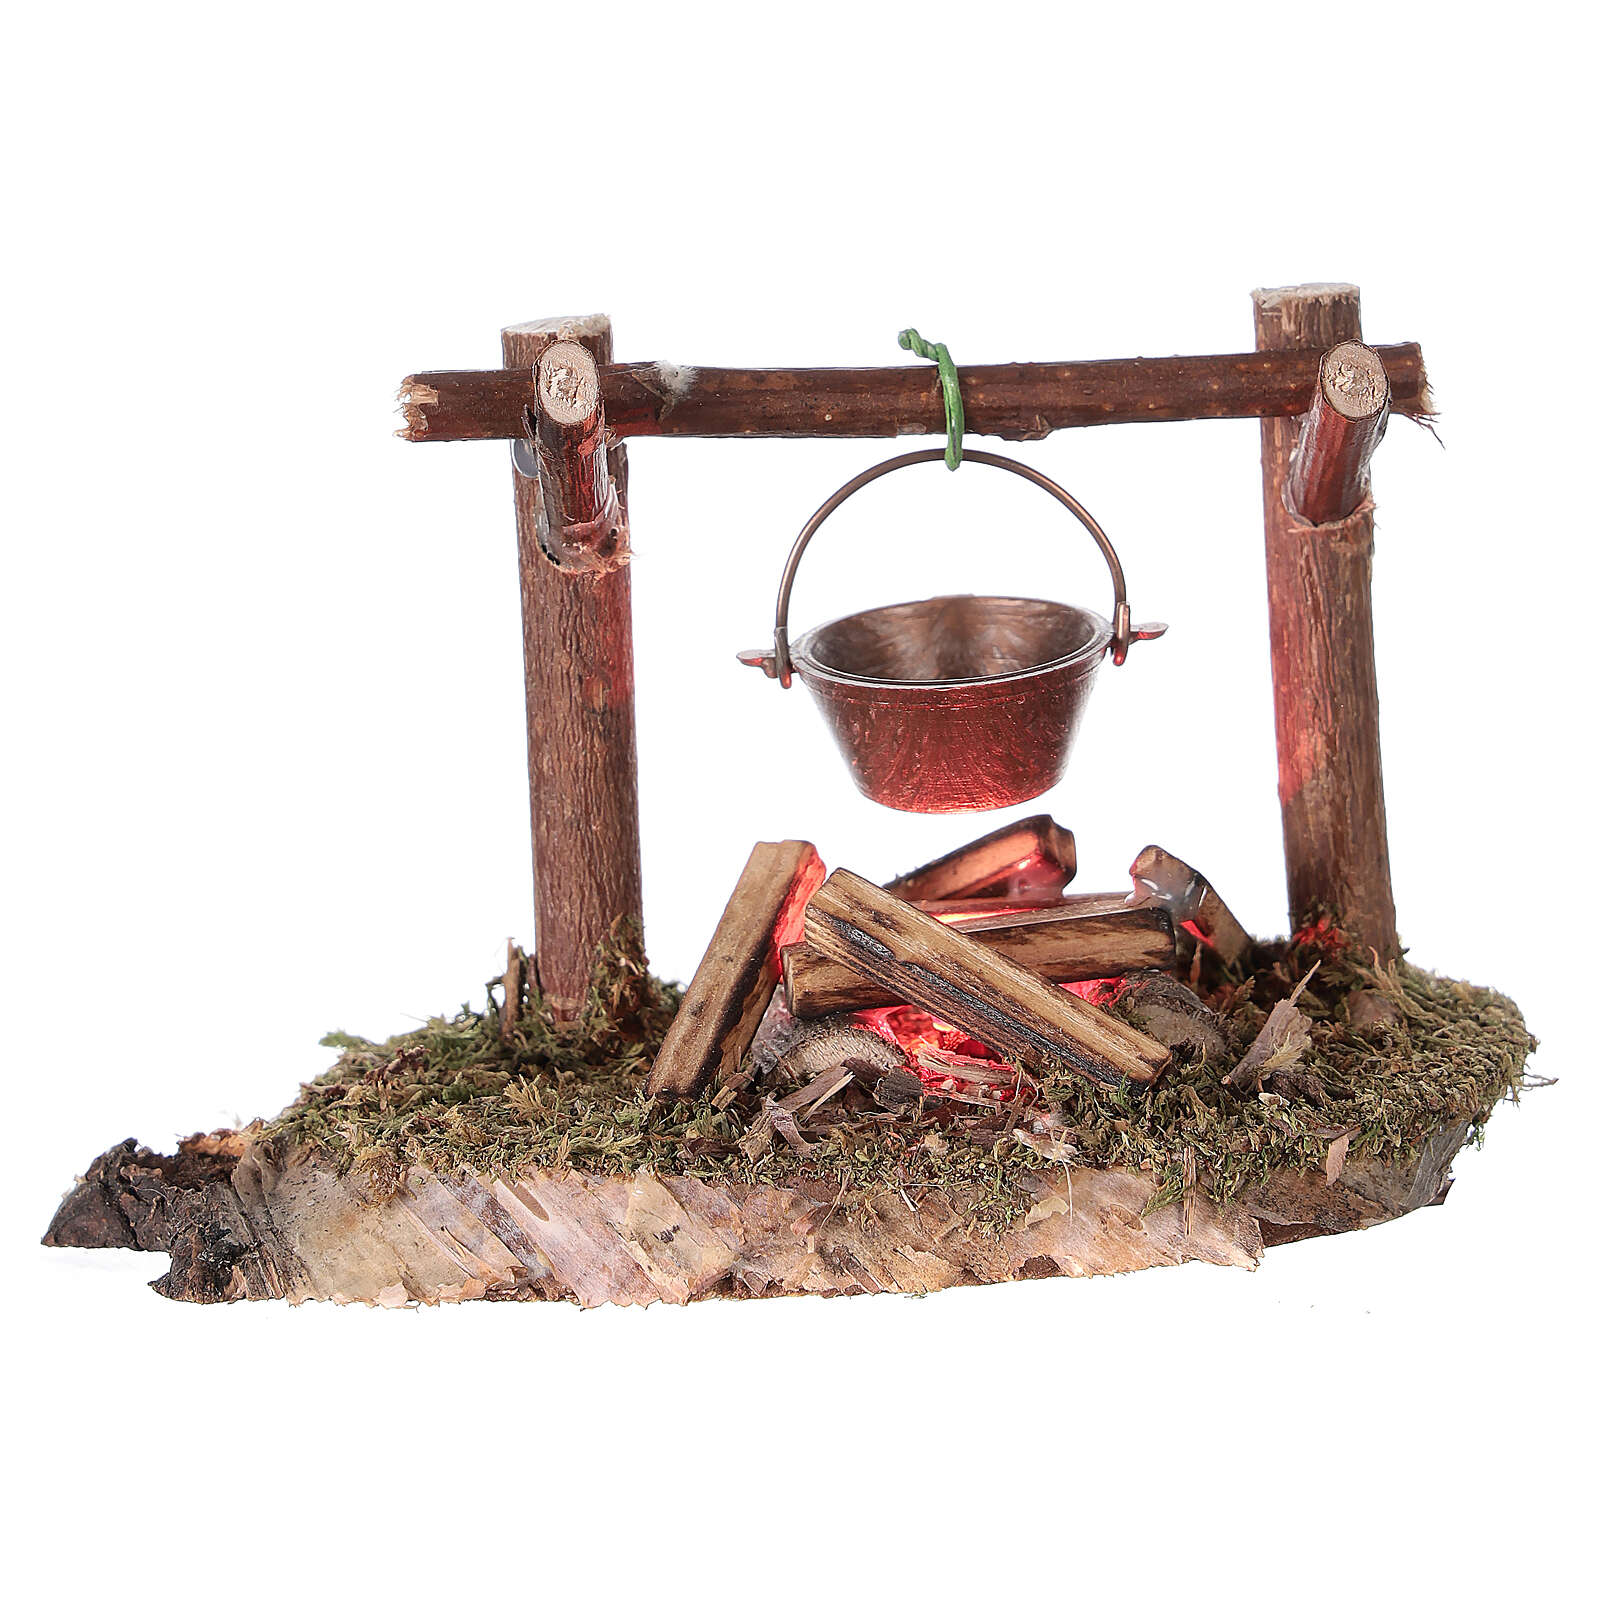 Bivouac figurine REAL flickering fire LED 4.5V nativity 8-10 cm 4